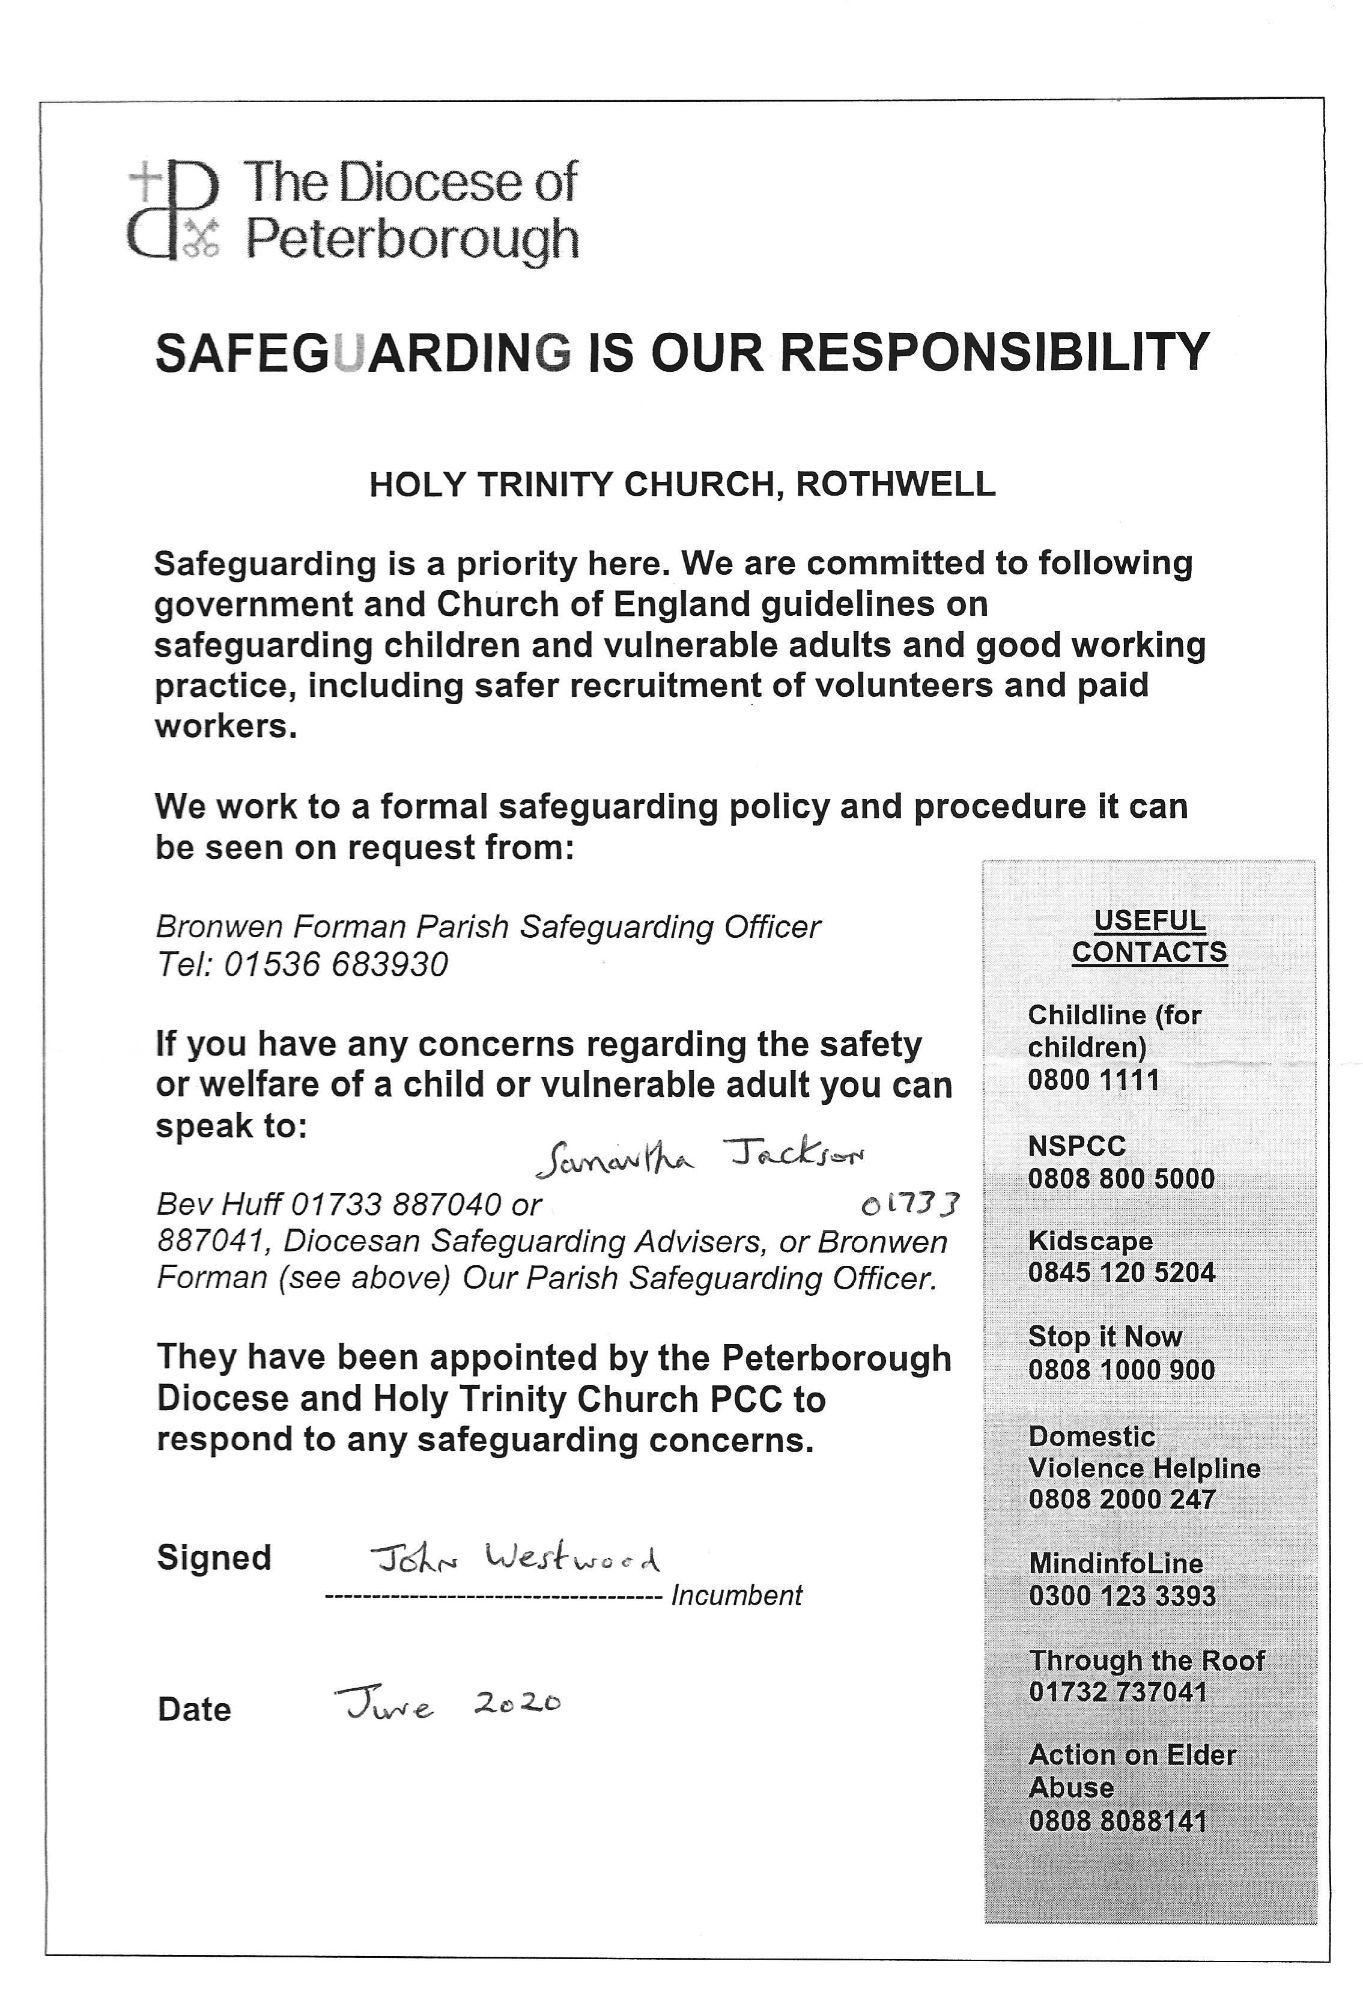 SafeguardingLetterwhiteHolyTrinity2020